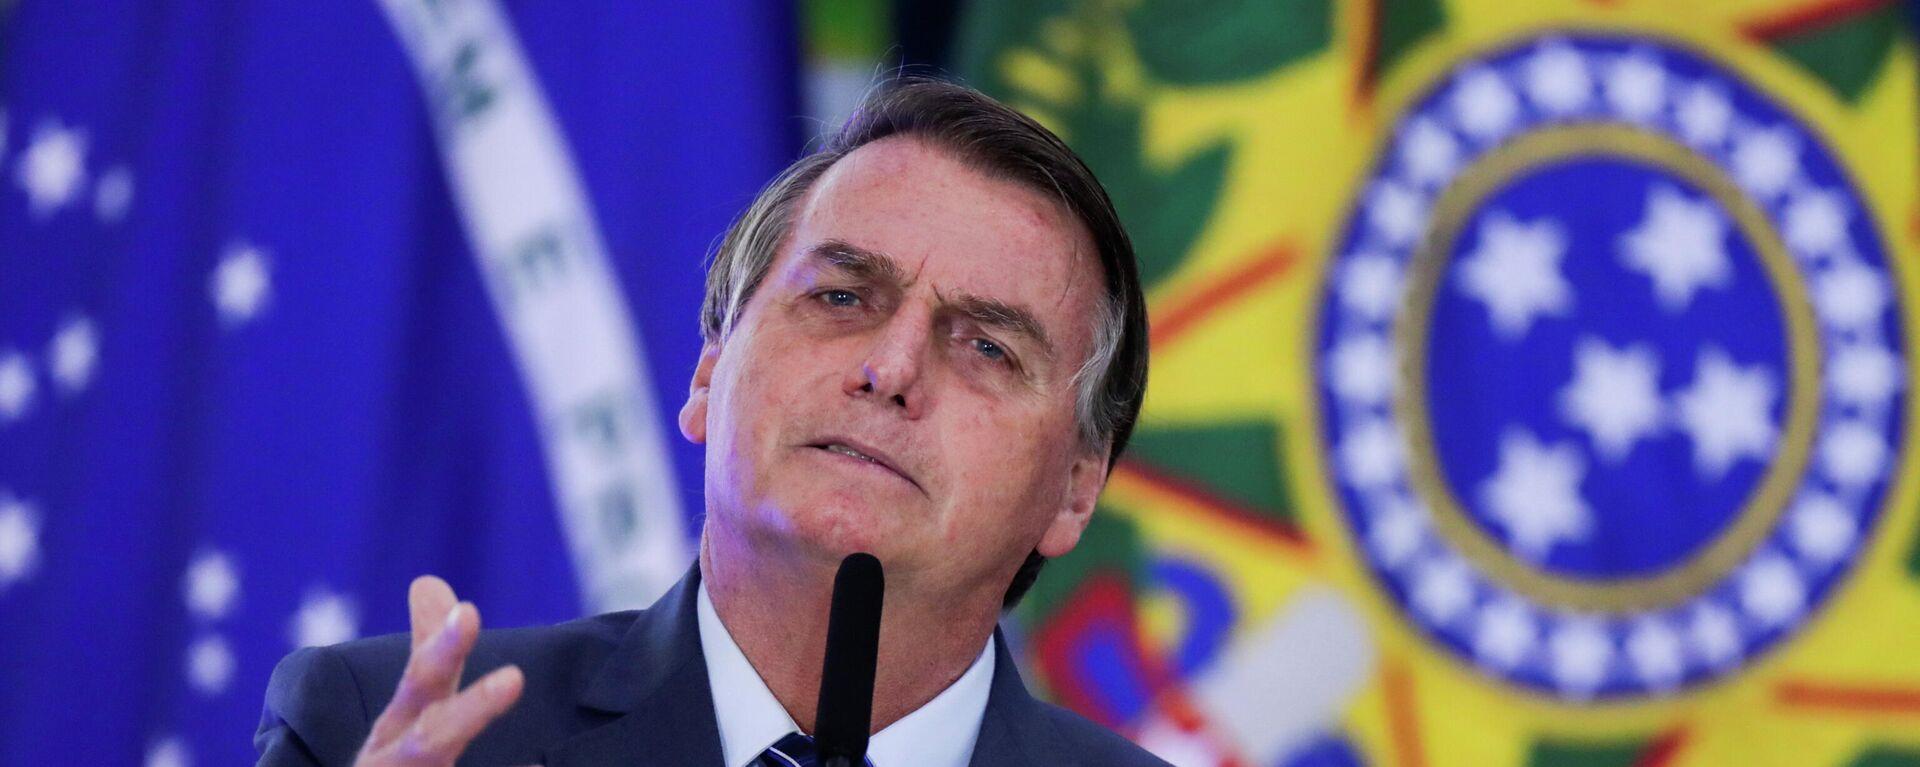 Jair Bolsonaro, presidente de Brasil - Sputnik Mundo, 1920, 21.05.2021